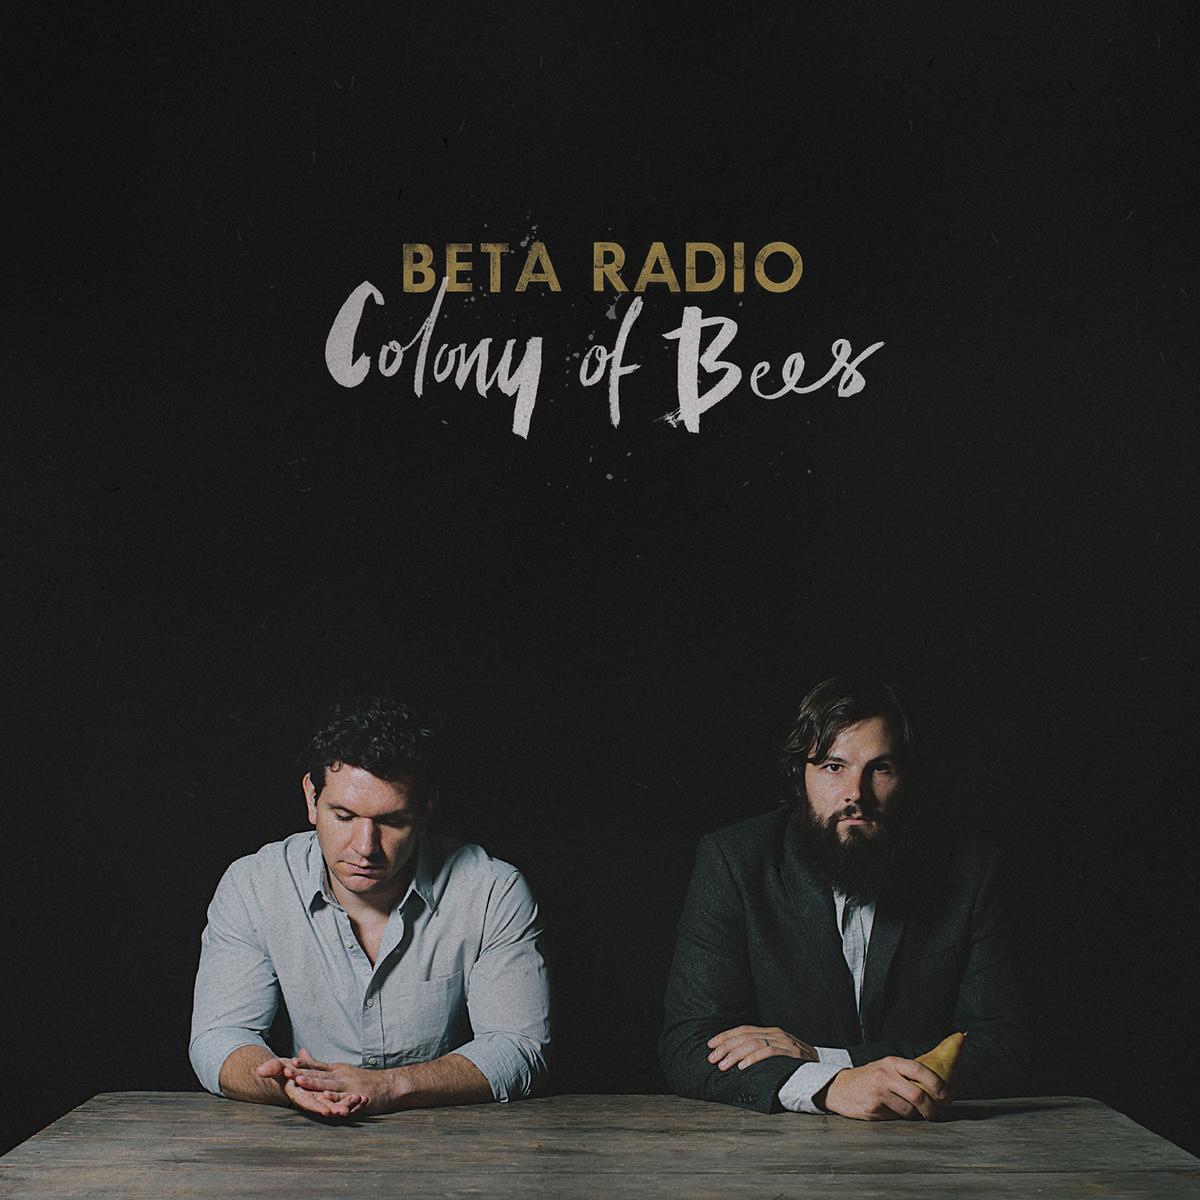 On the Frame - Beta Radio